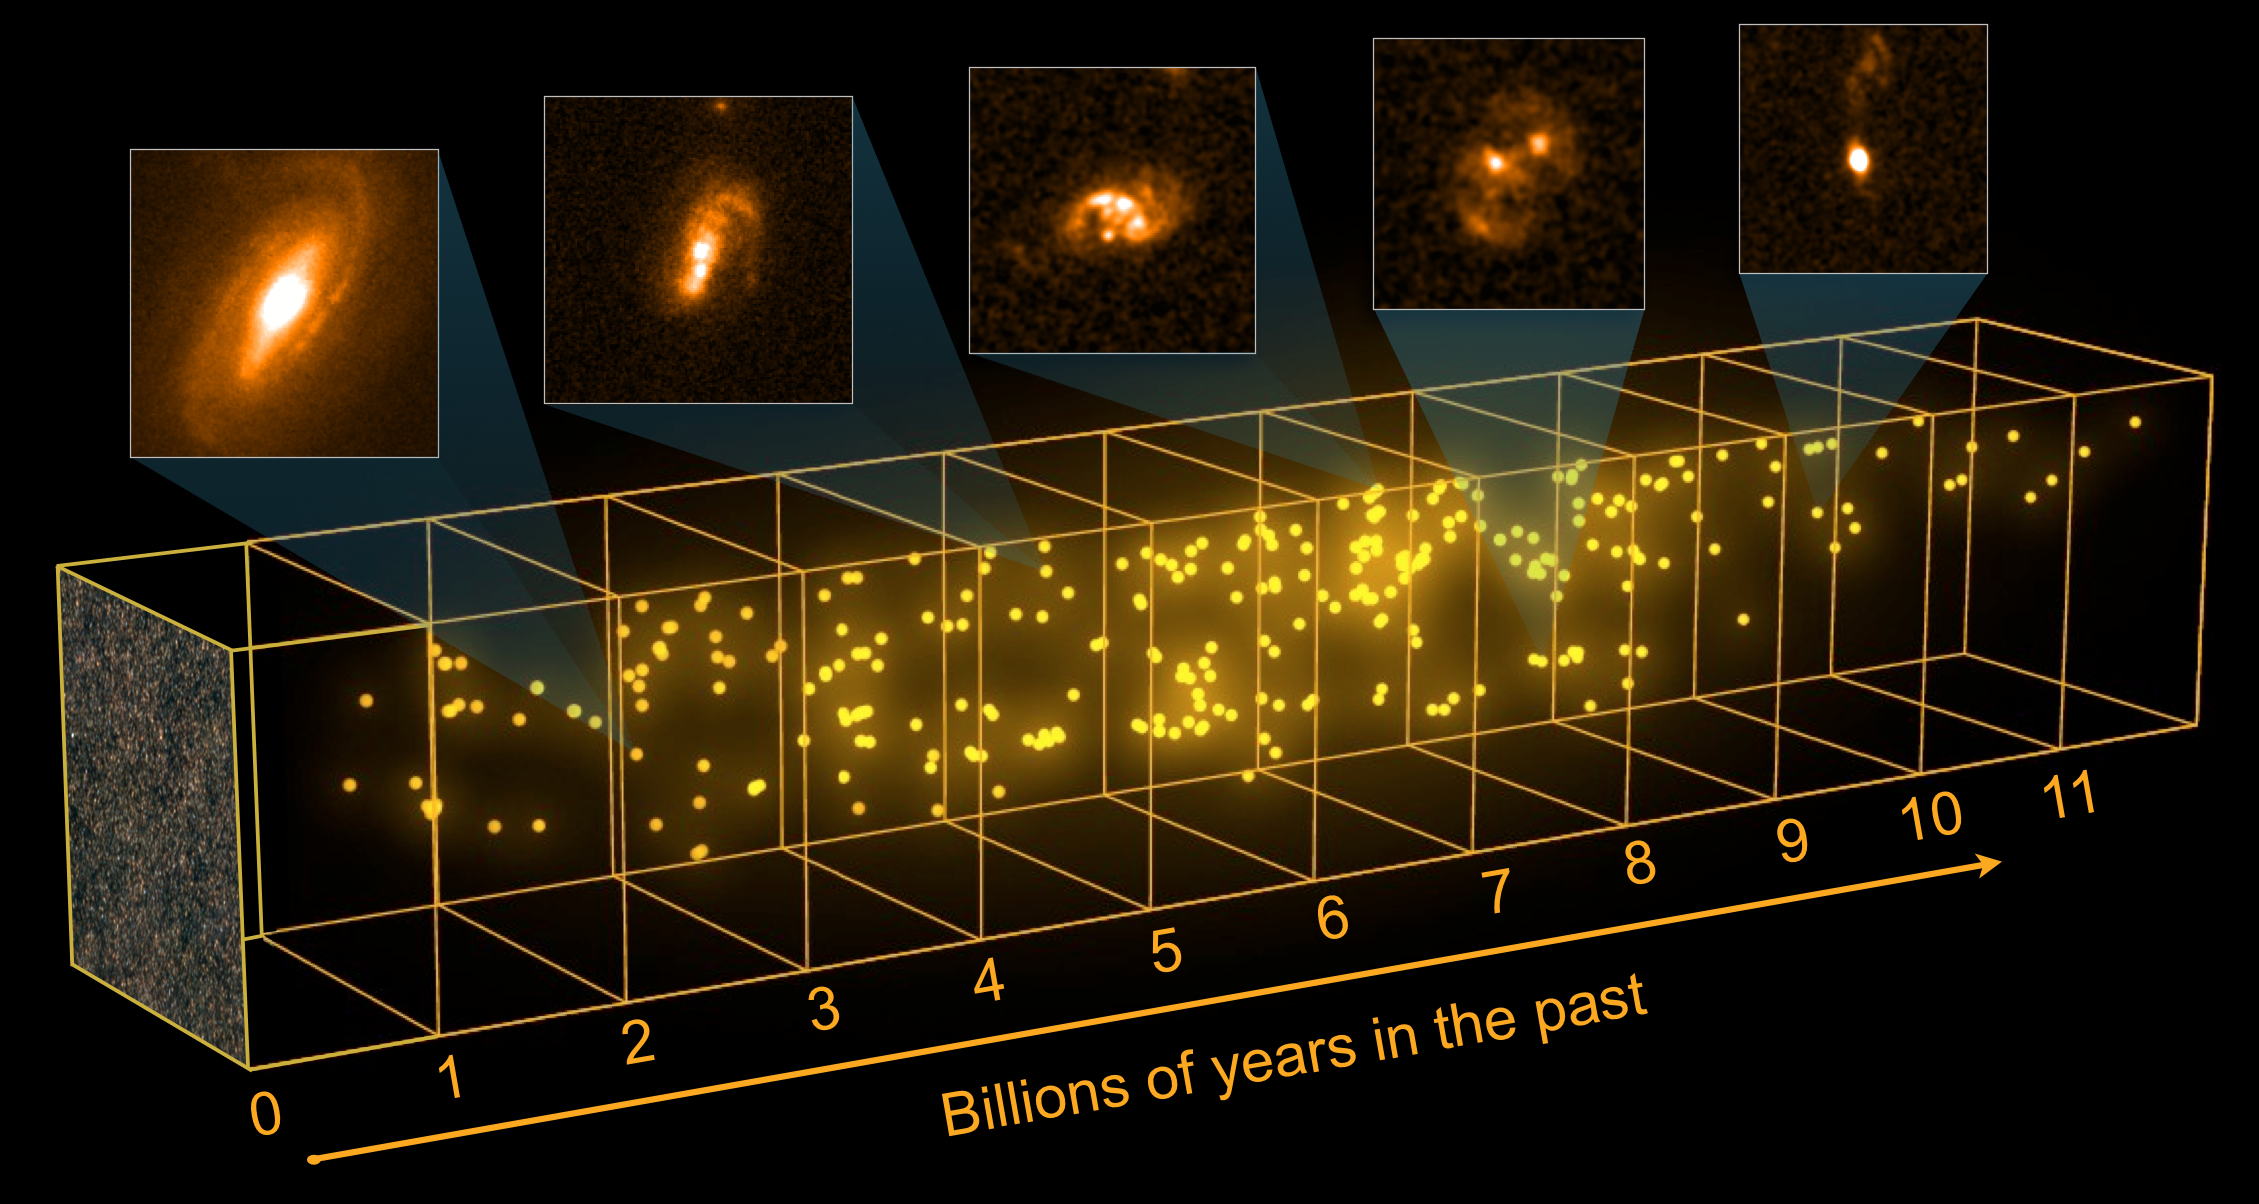 1567216769821-Herschel_Keck_GalaxyCensus.jpg